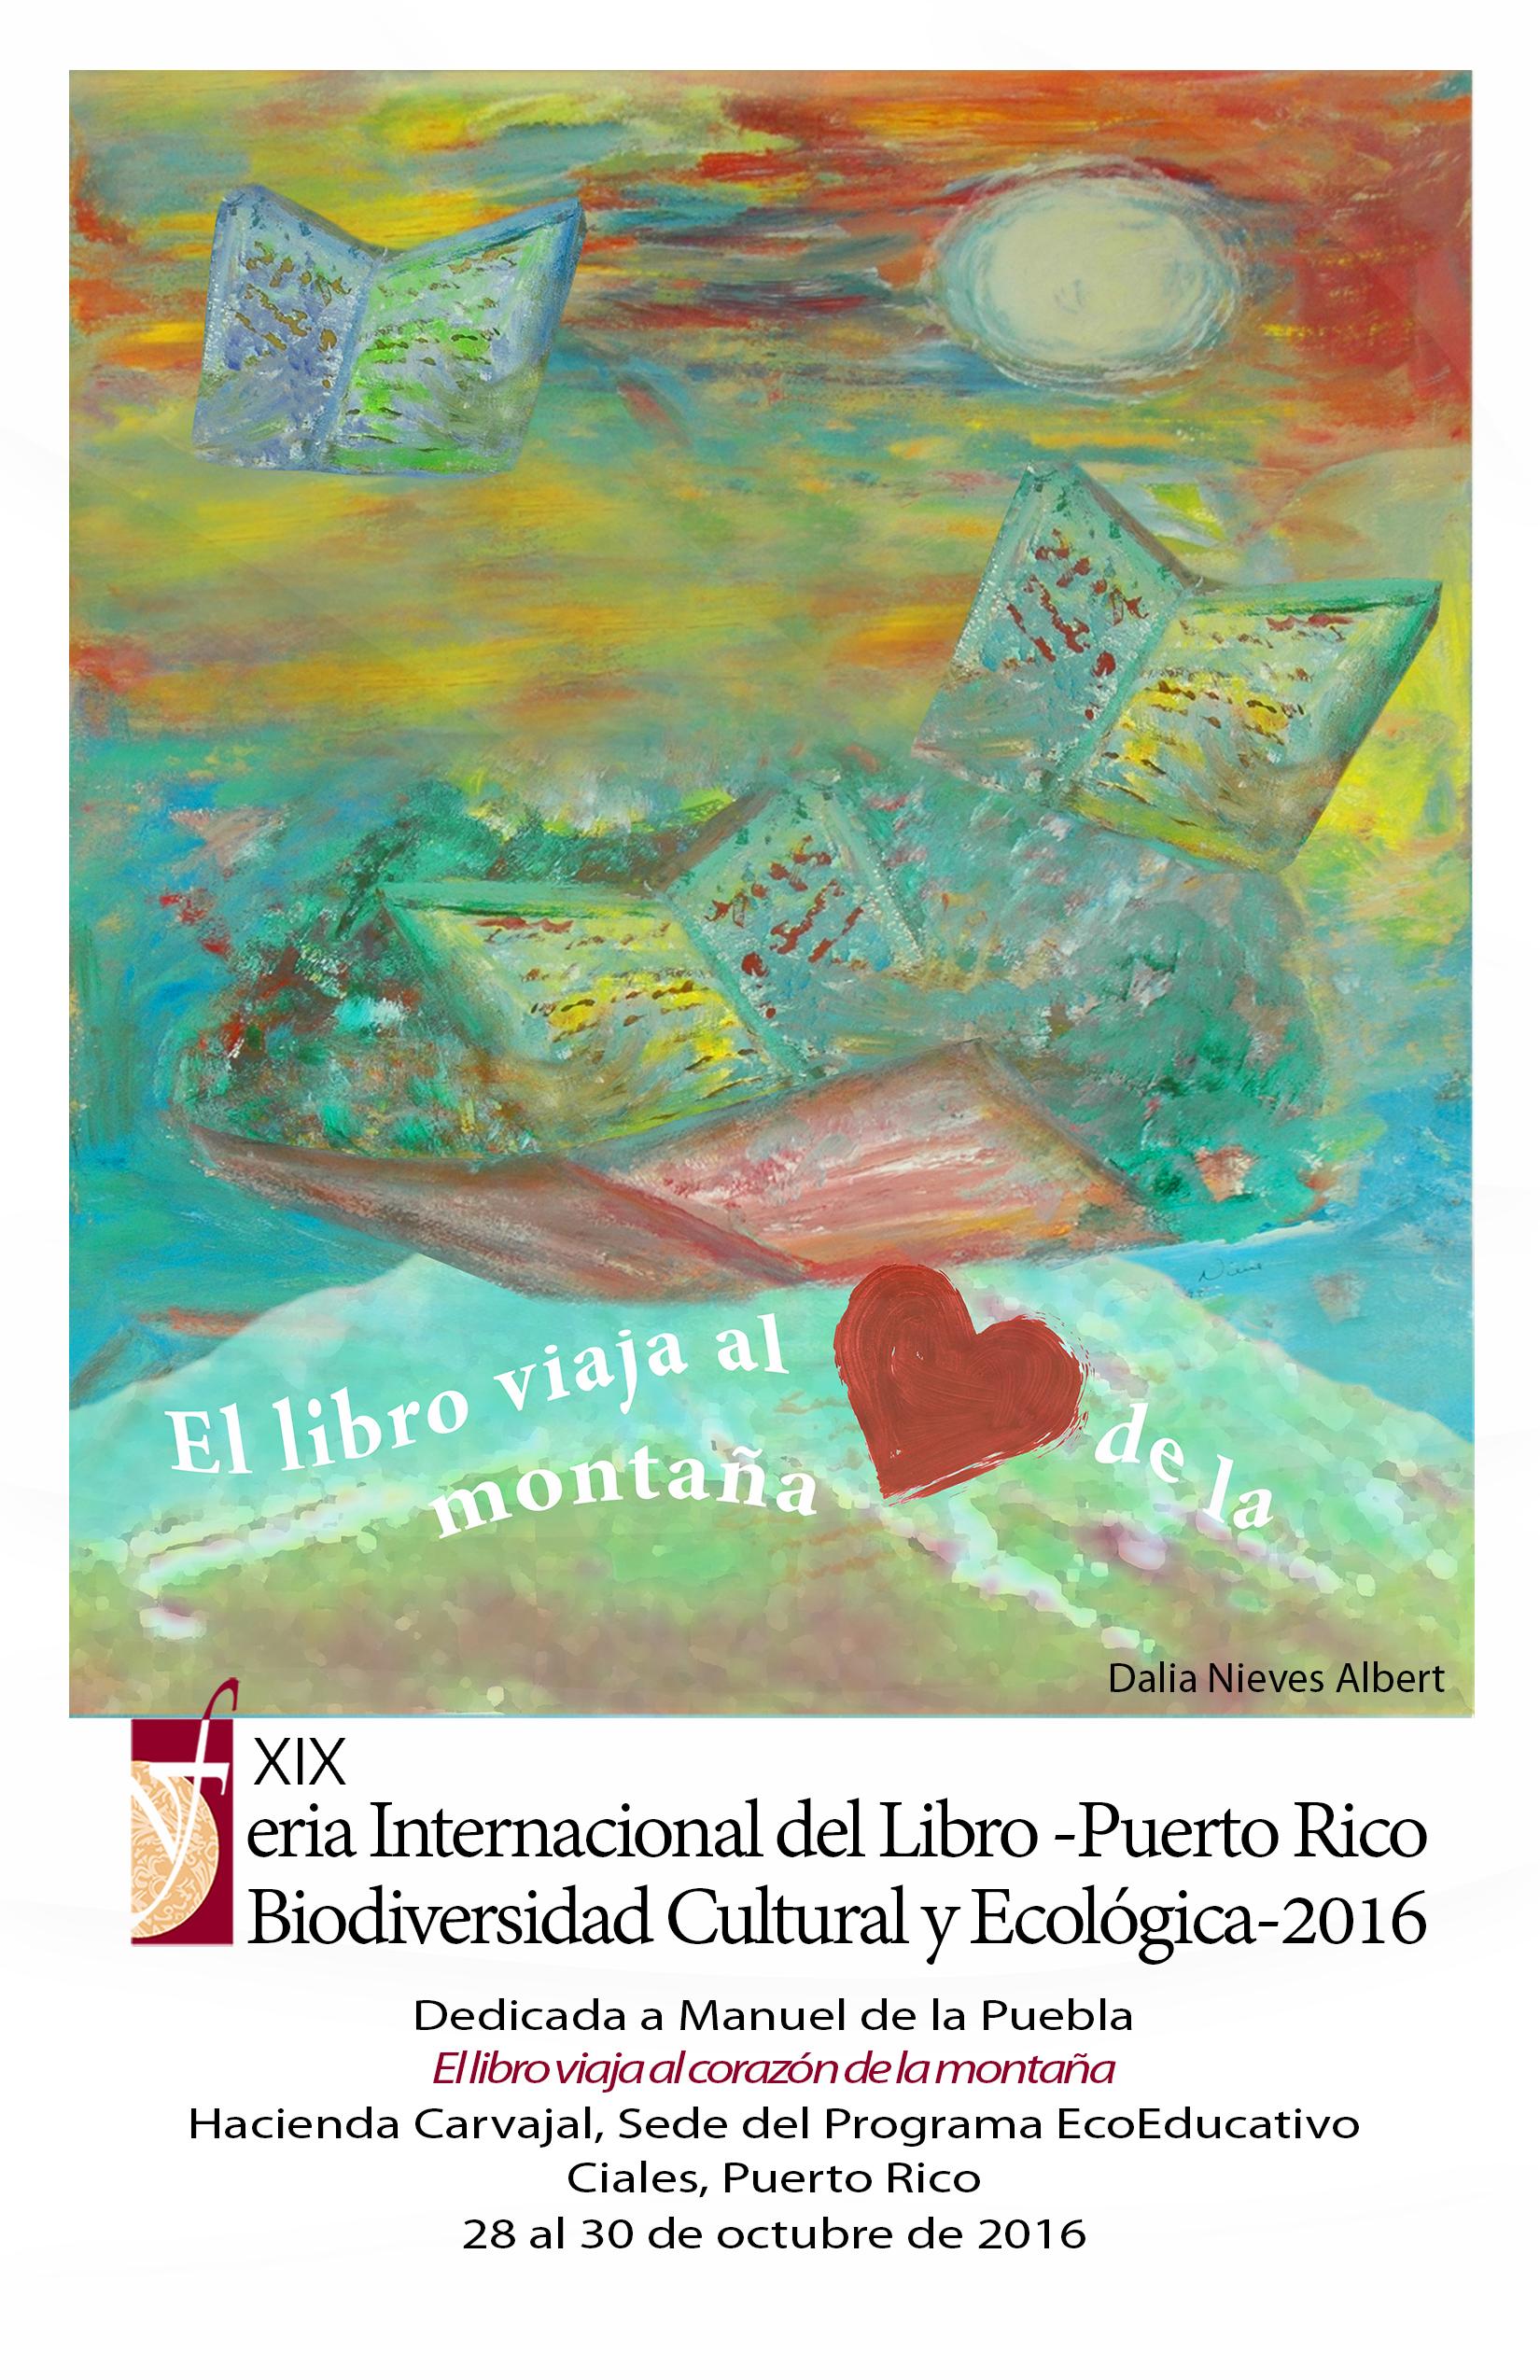 cartel promocional de la Feria del Libro para 2016. (Foto suministrada)